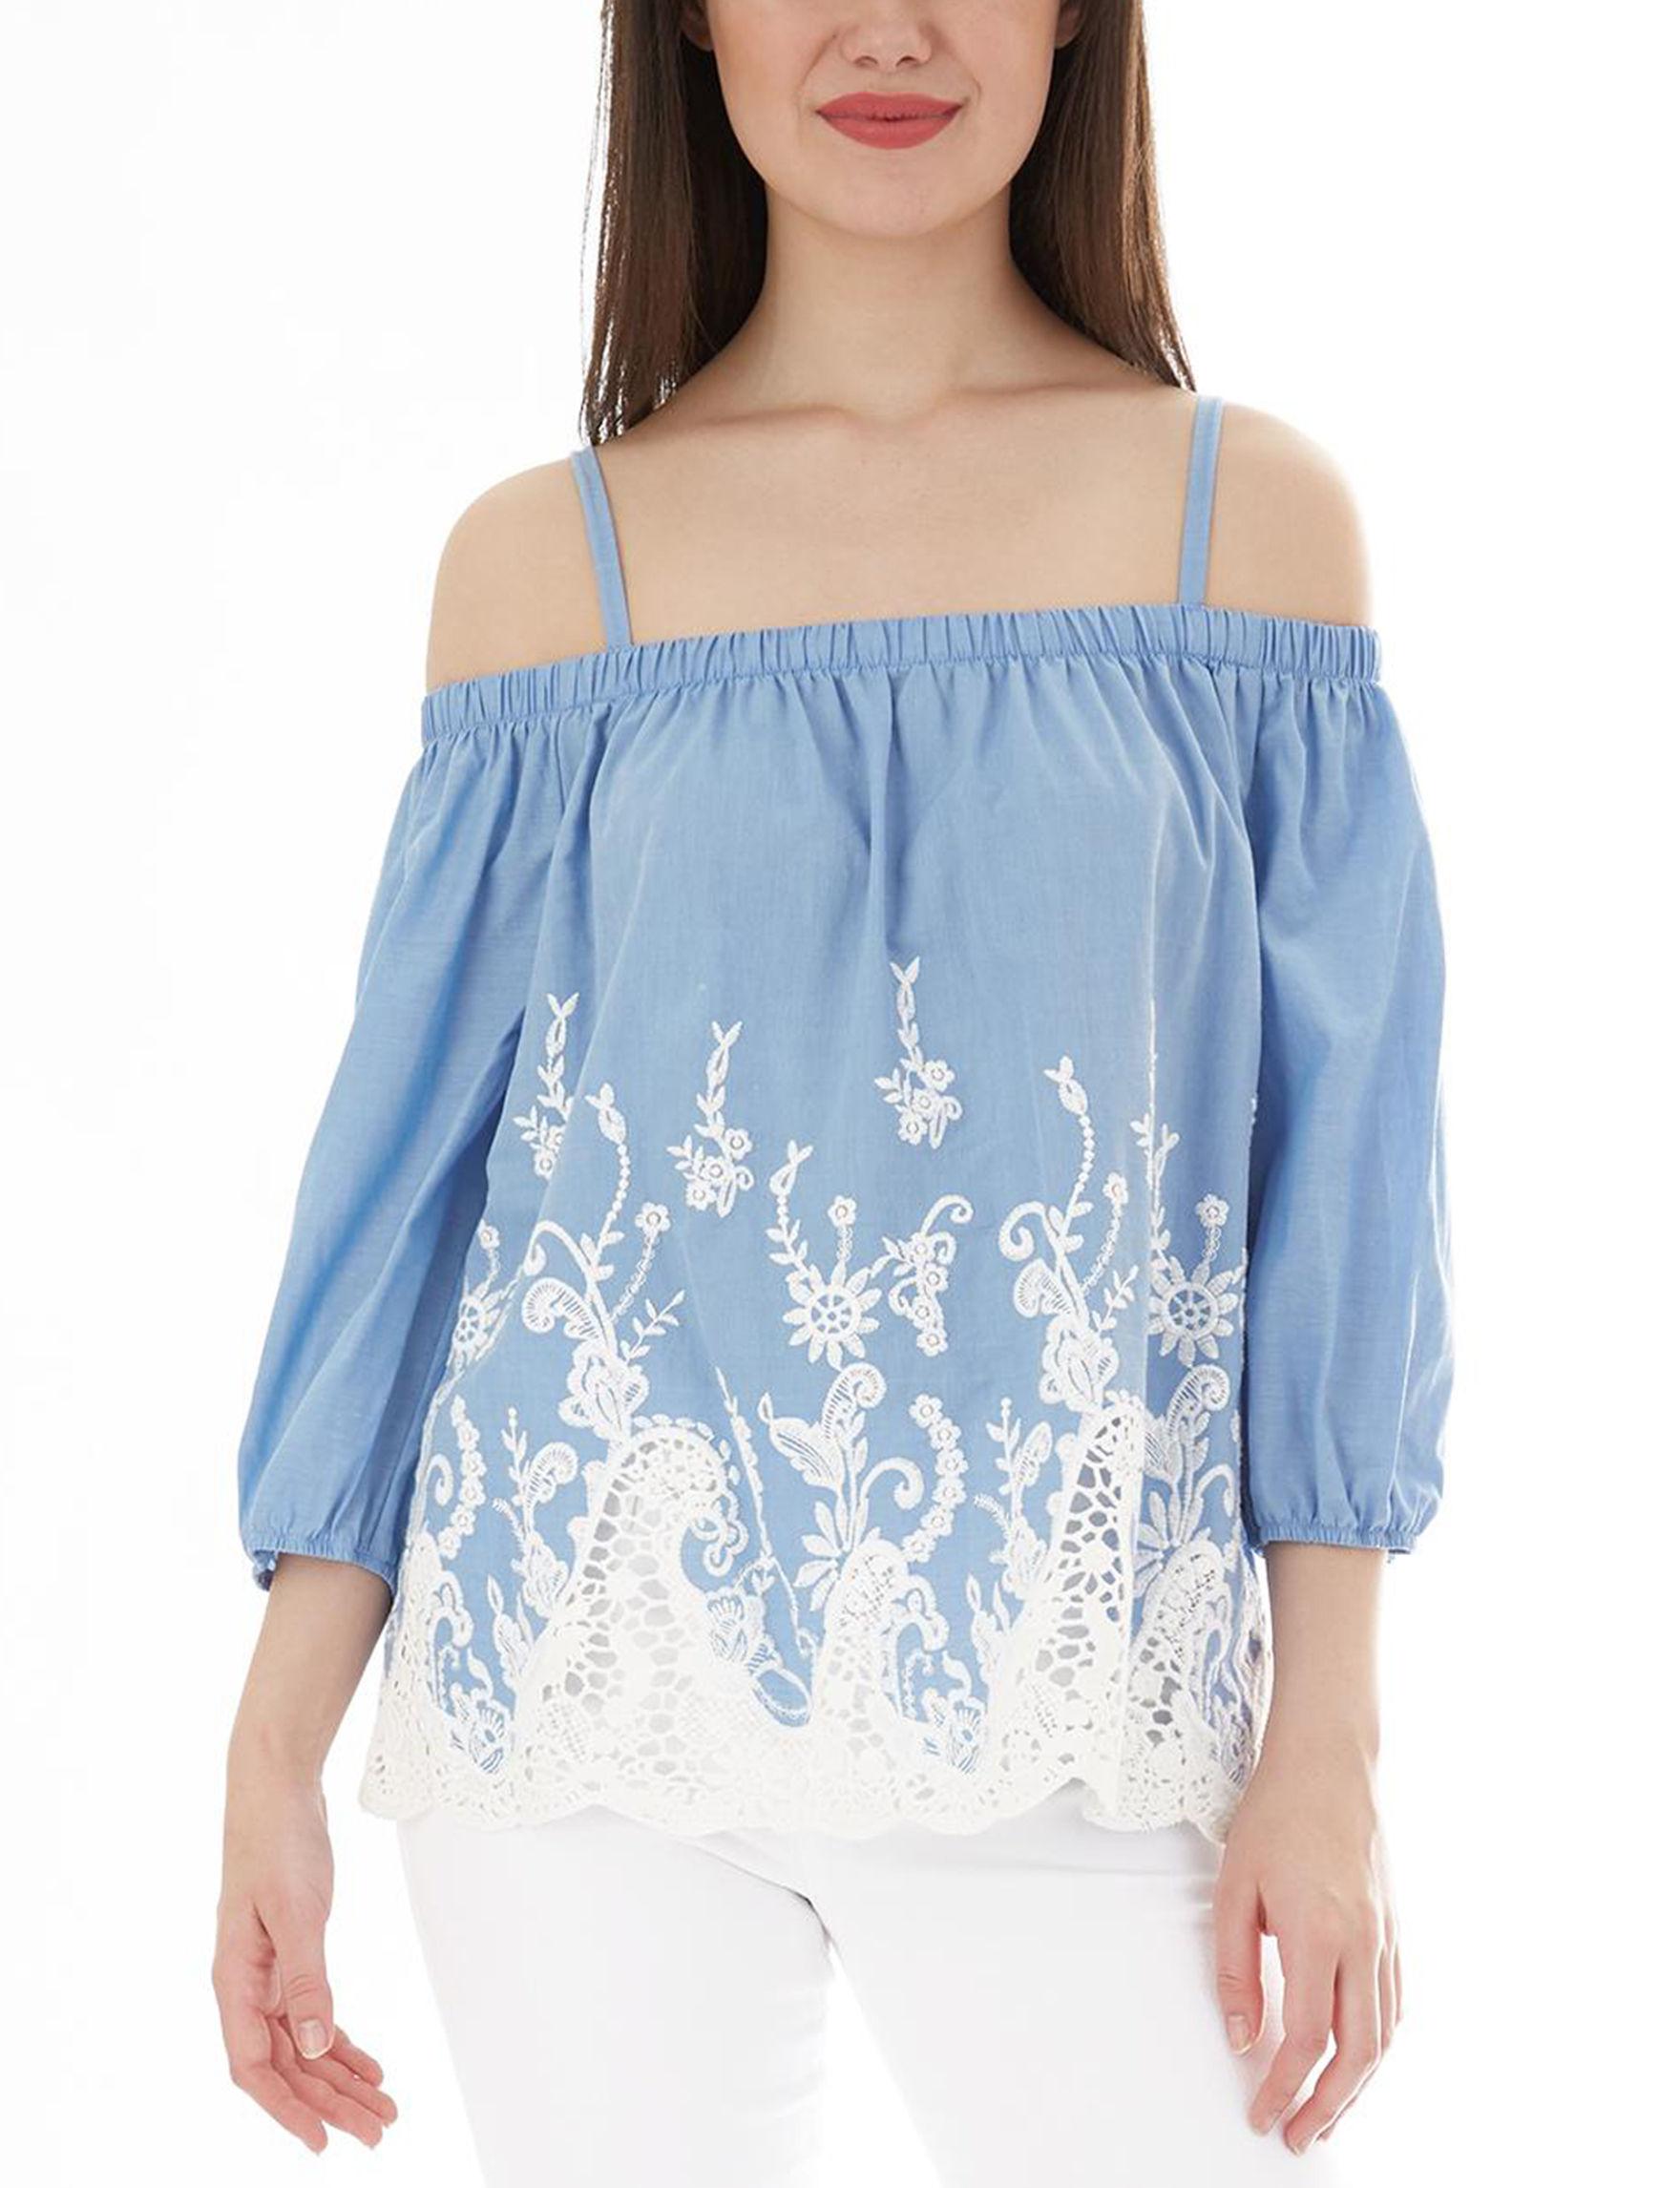 A. Byer Denim Blue Shirts & Blouses